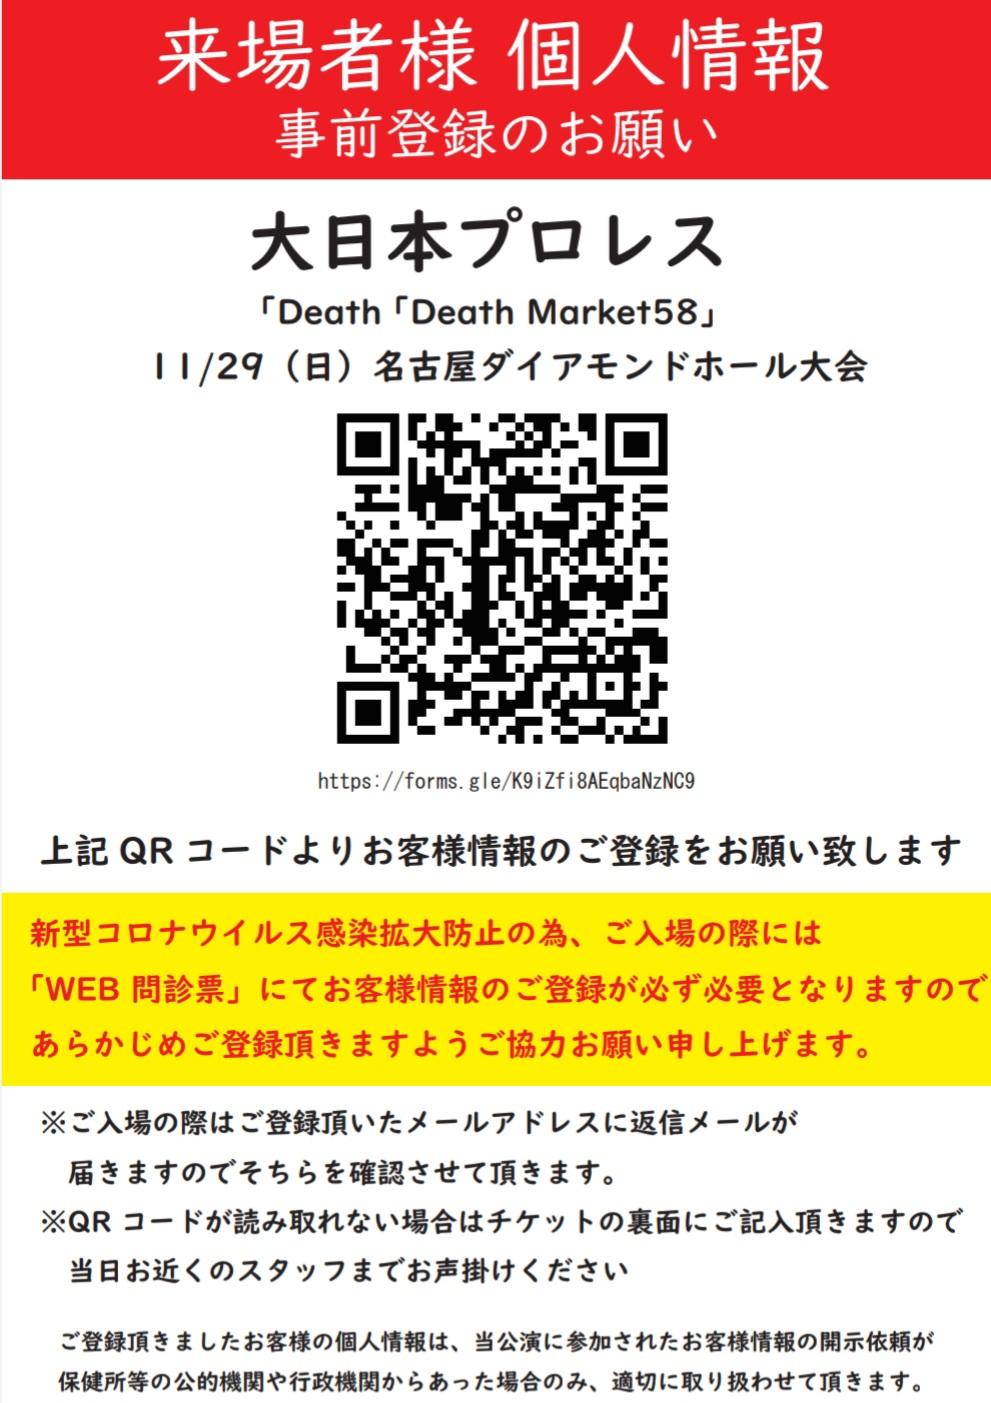 「Death Market58」 愛知・名古屋ダイアモンドホール大会※新型コロナウィルス対策座席表でのご案内となります。